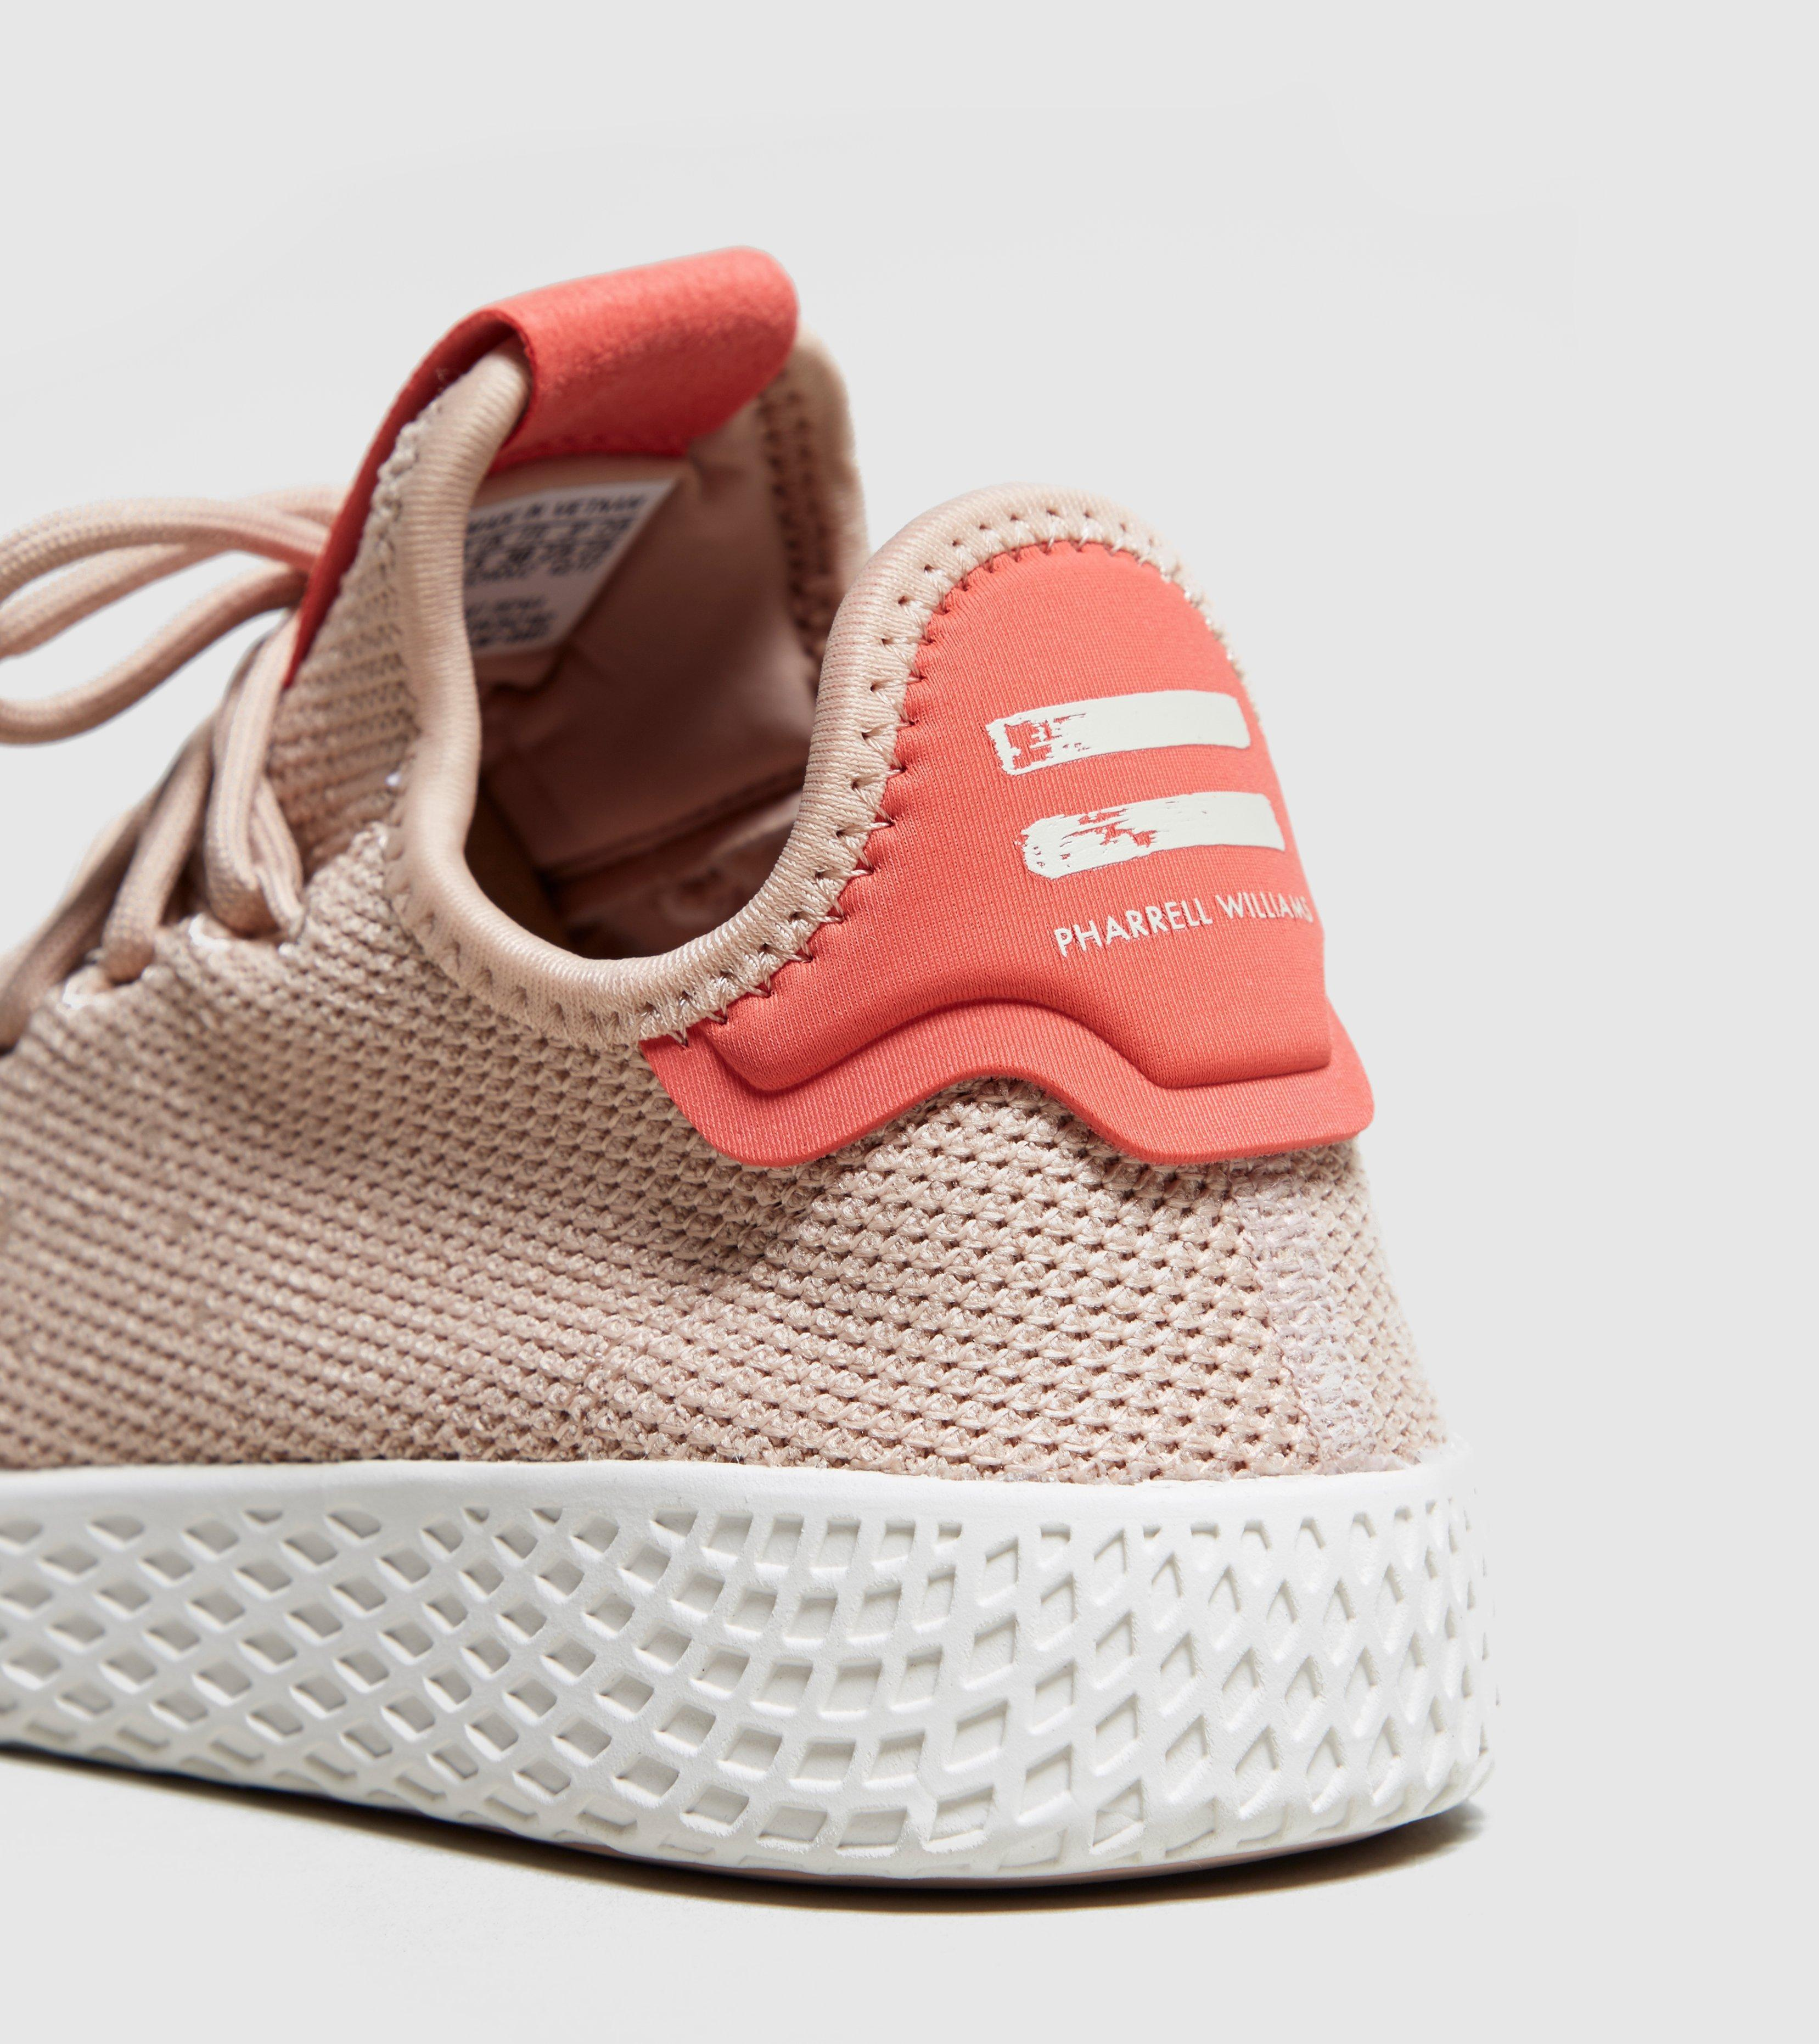 separation shoes 918b8 71476 Lyst - adidas Originals X Pharrell Williams Tennis Hu Womens